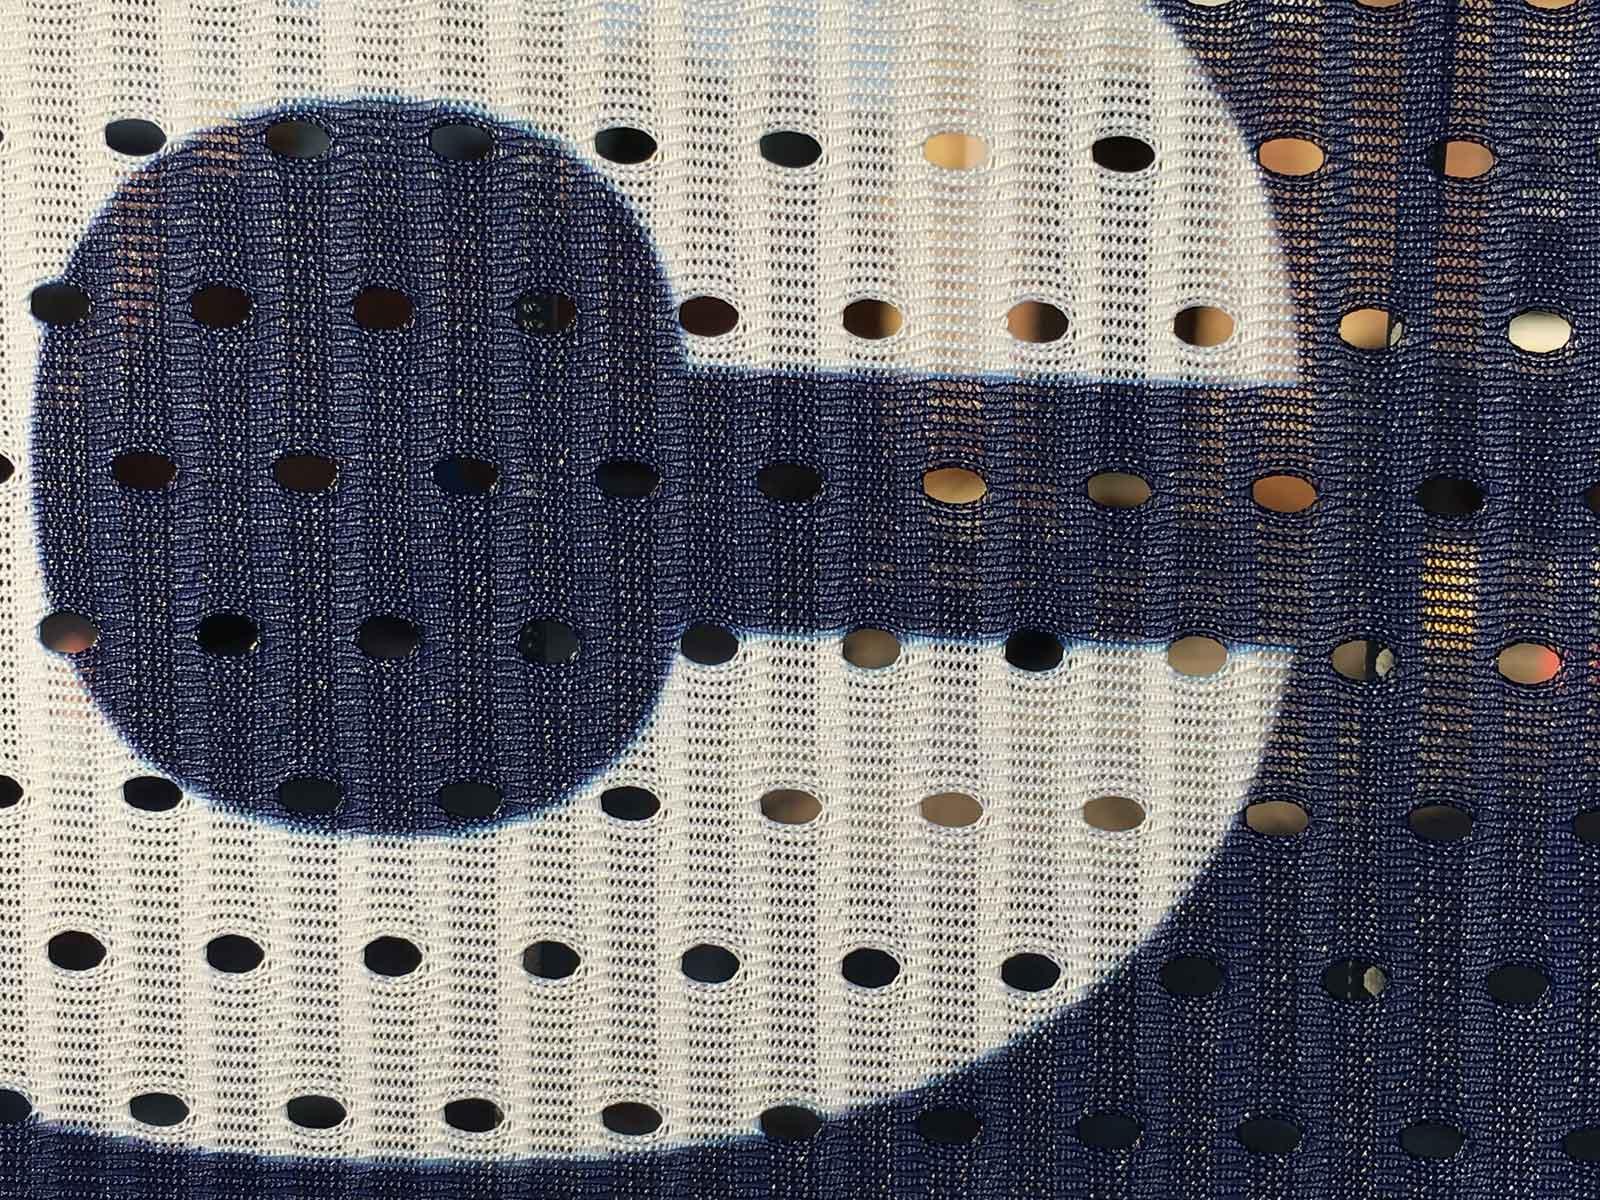 b61f28645f6b Airmesh Flag Mesh Fabric Banner - large format soft signage